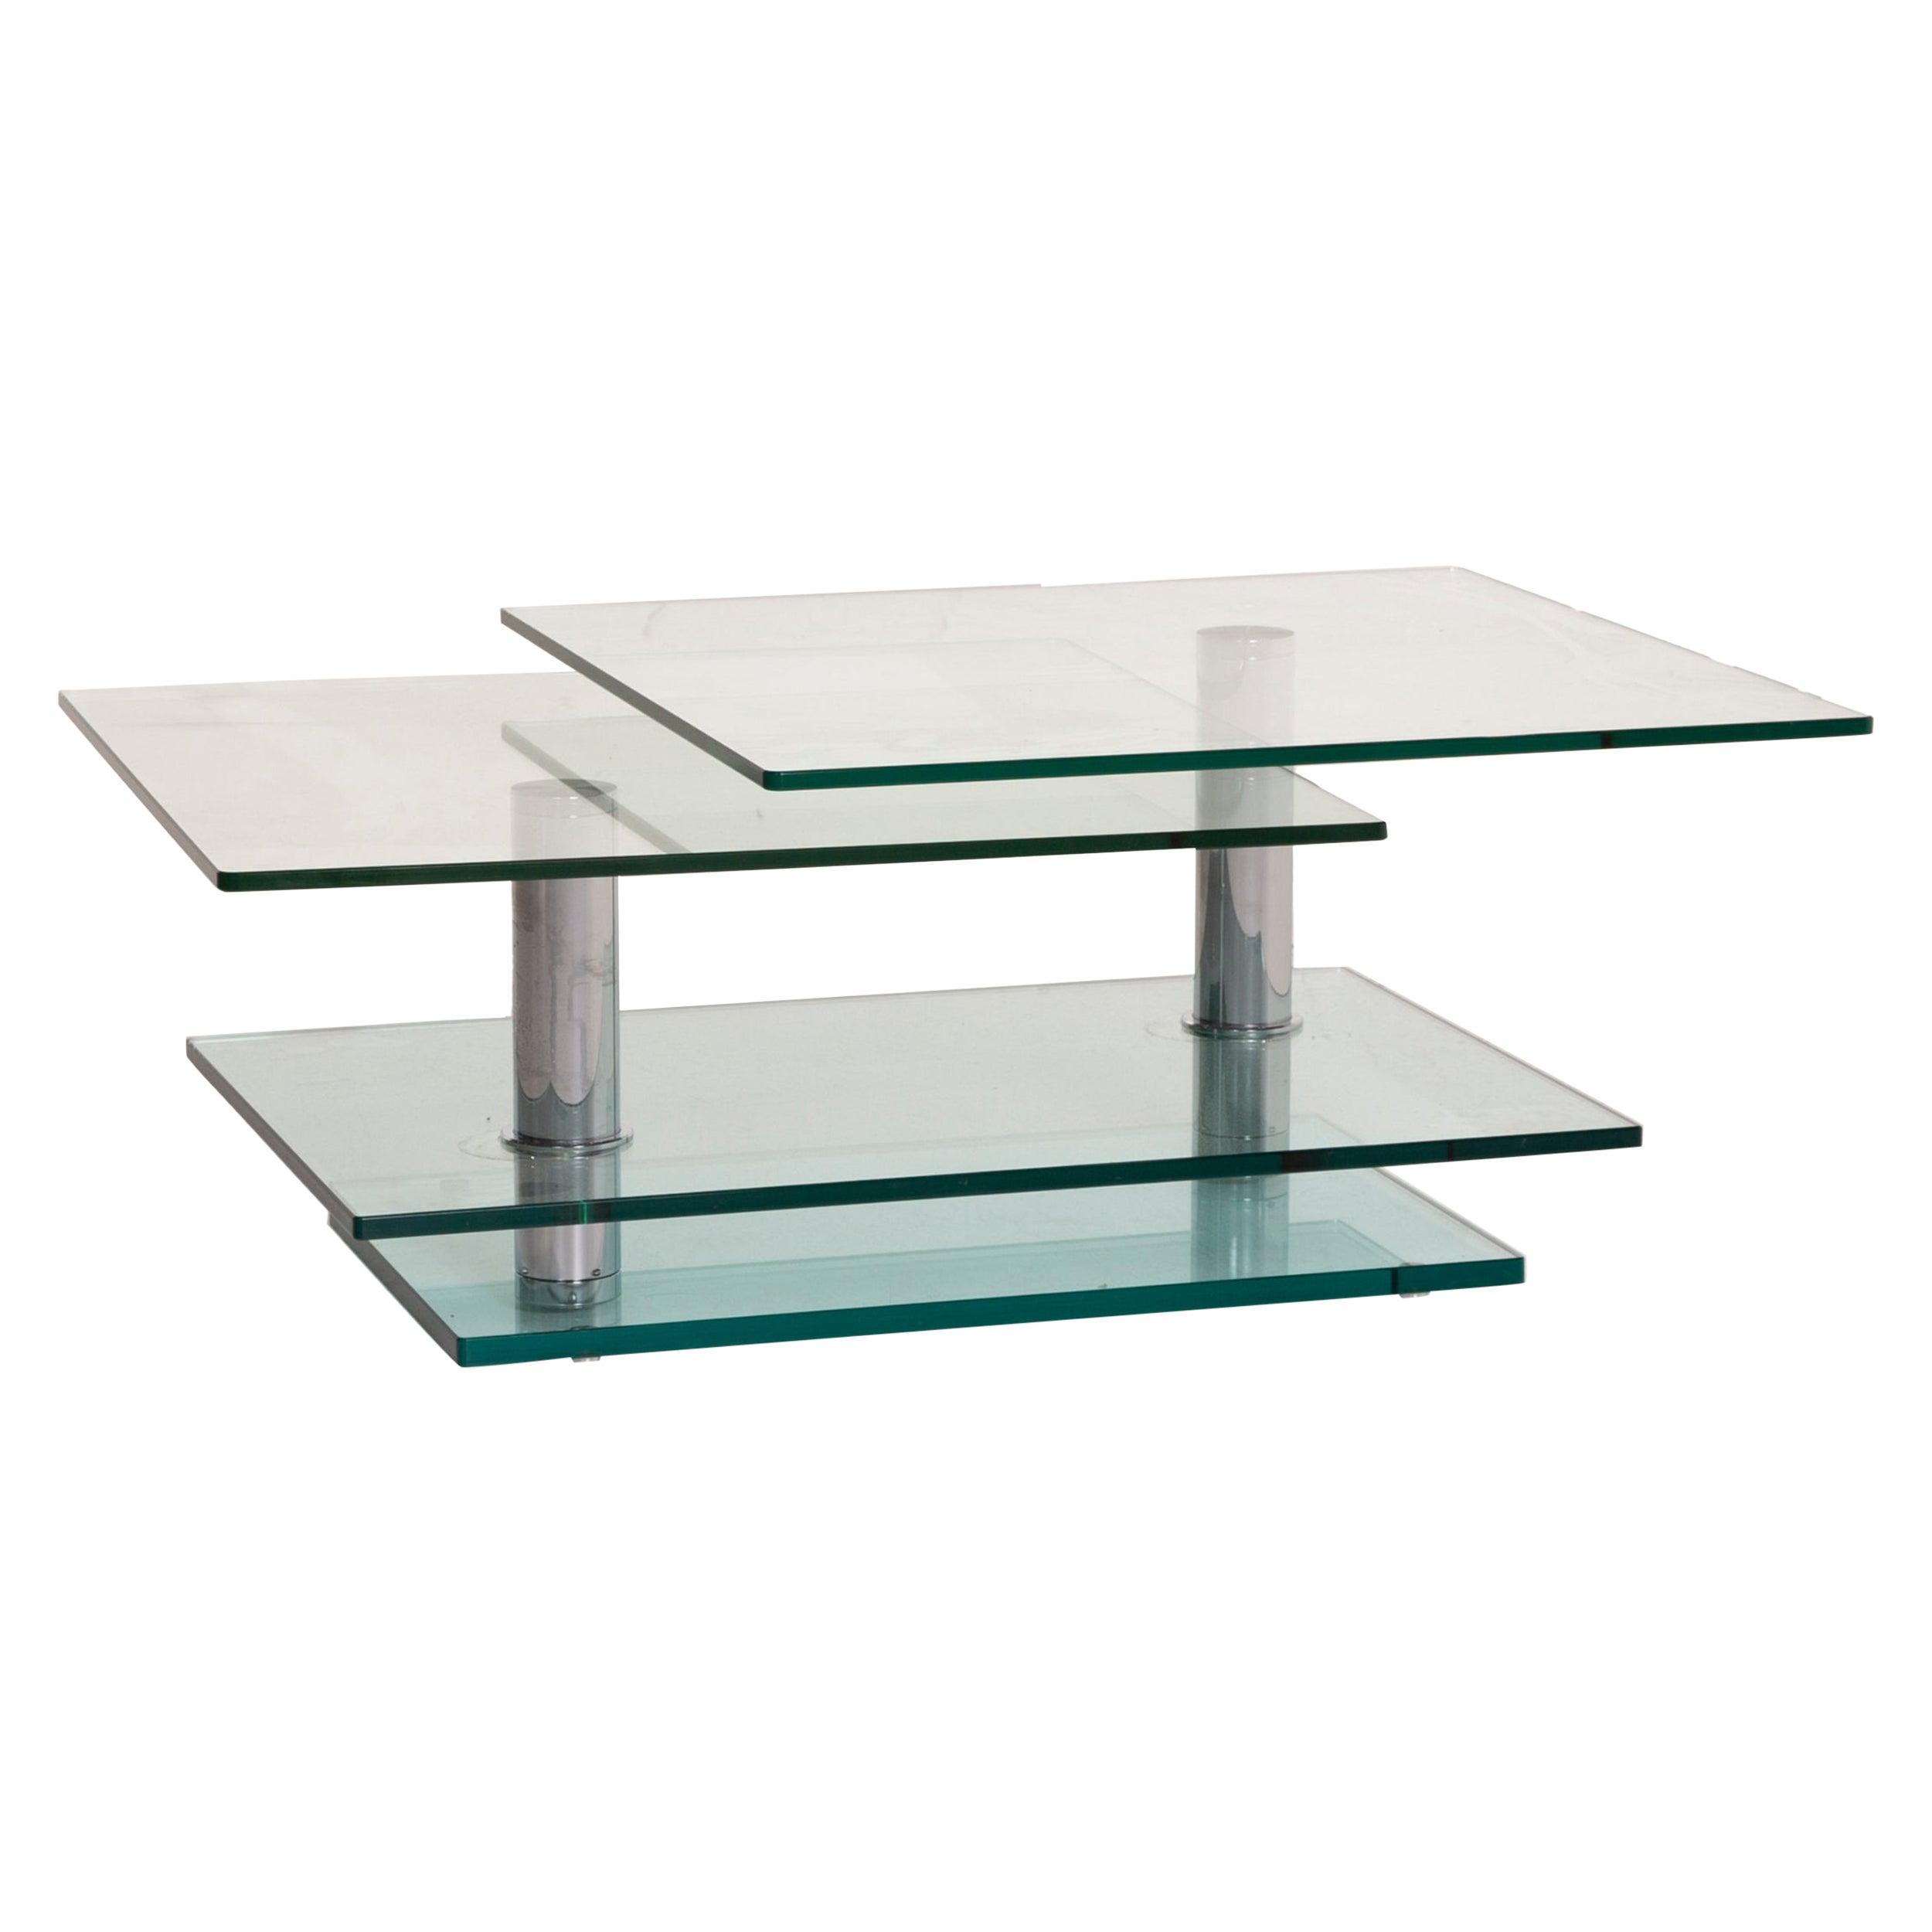 Ronald Schmitt K500 Glass Table Coffee Table Chrome Function